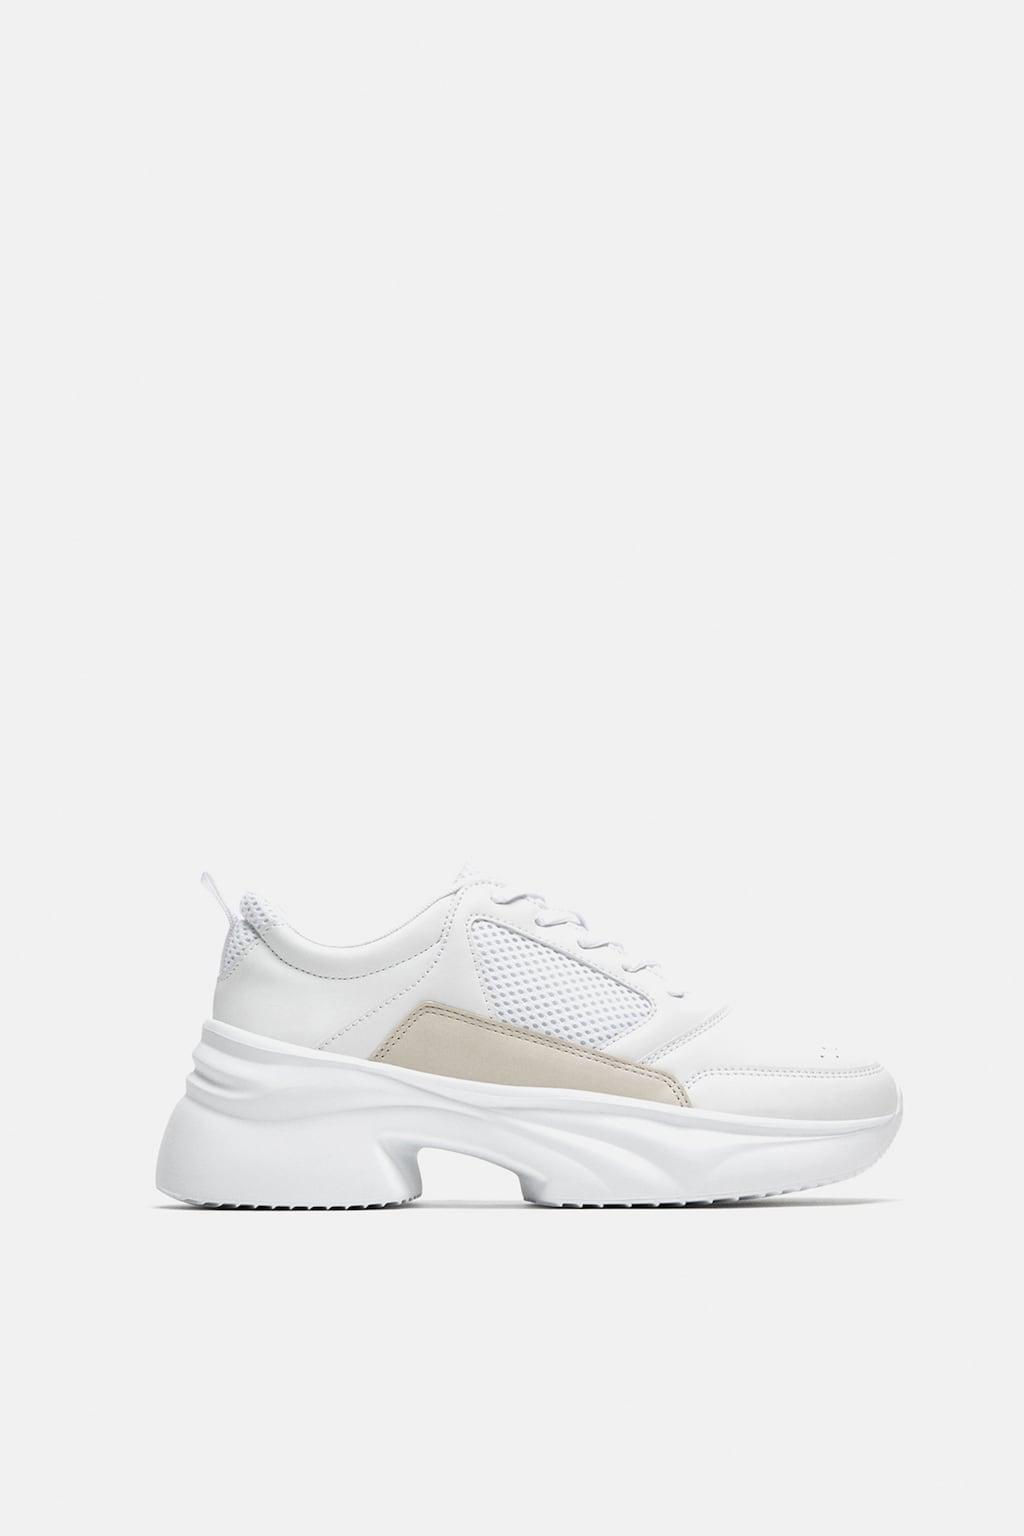 Eniwhere Fashion - Sneakers vs Slingback - Fall 2018